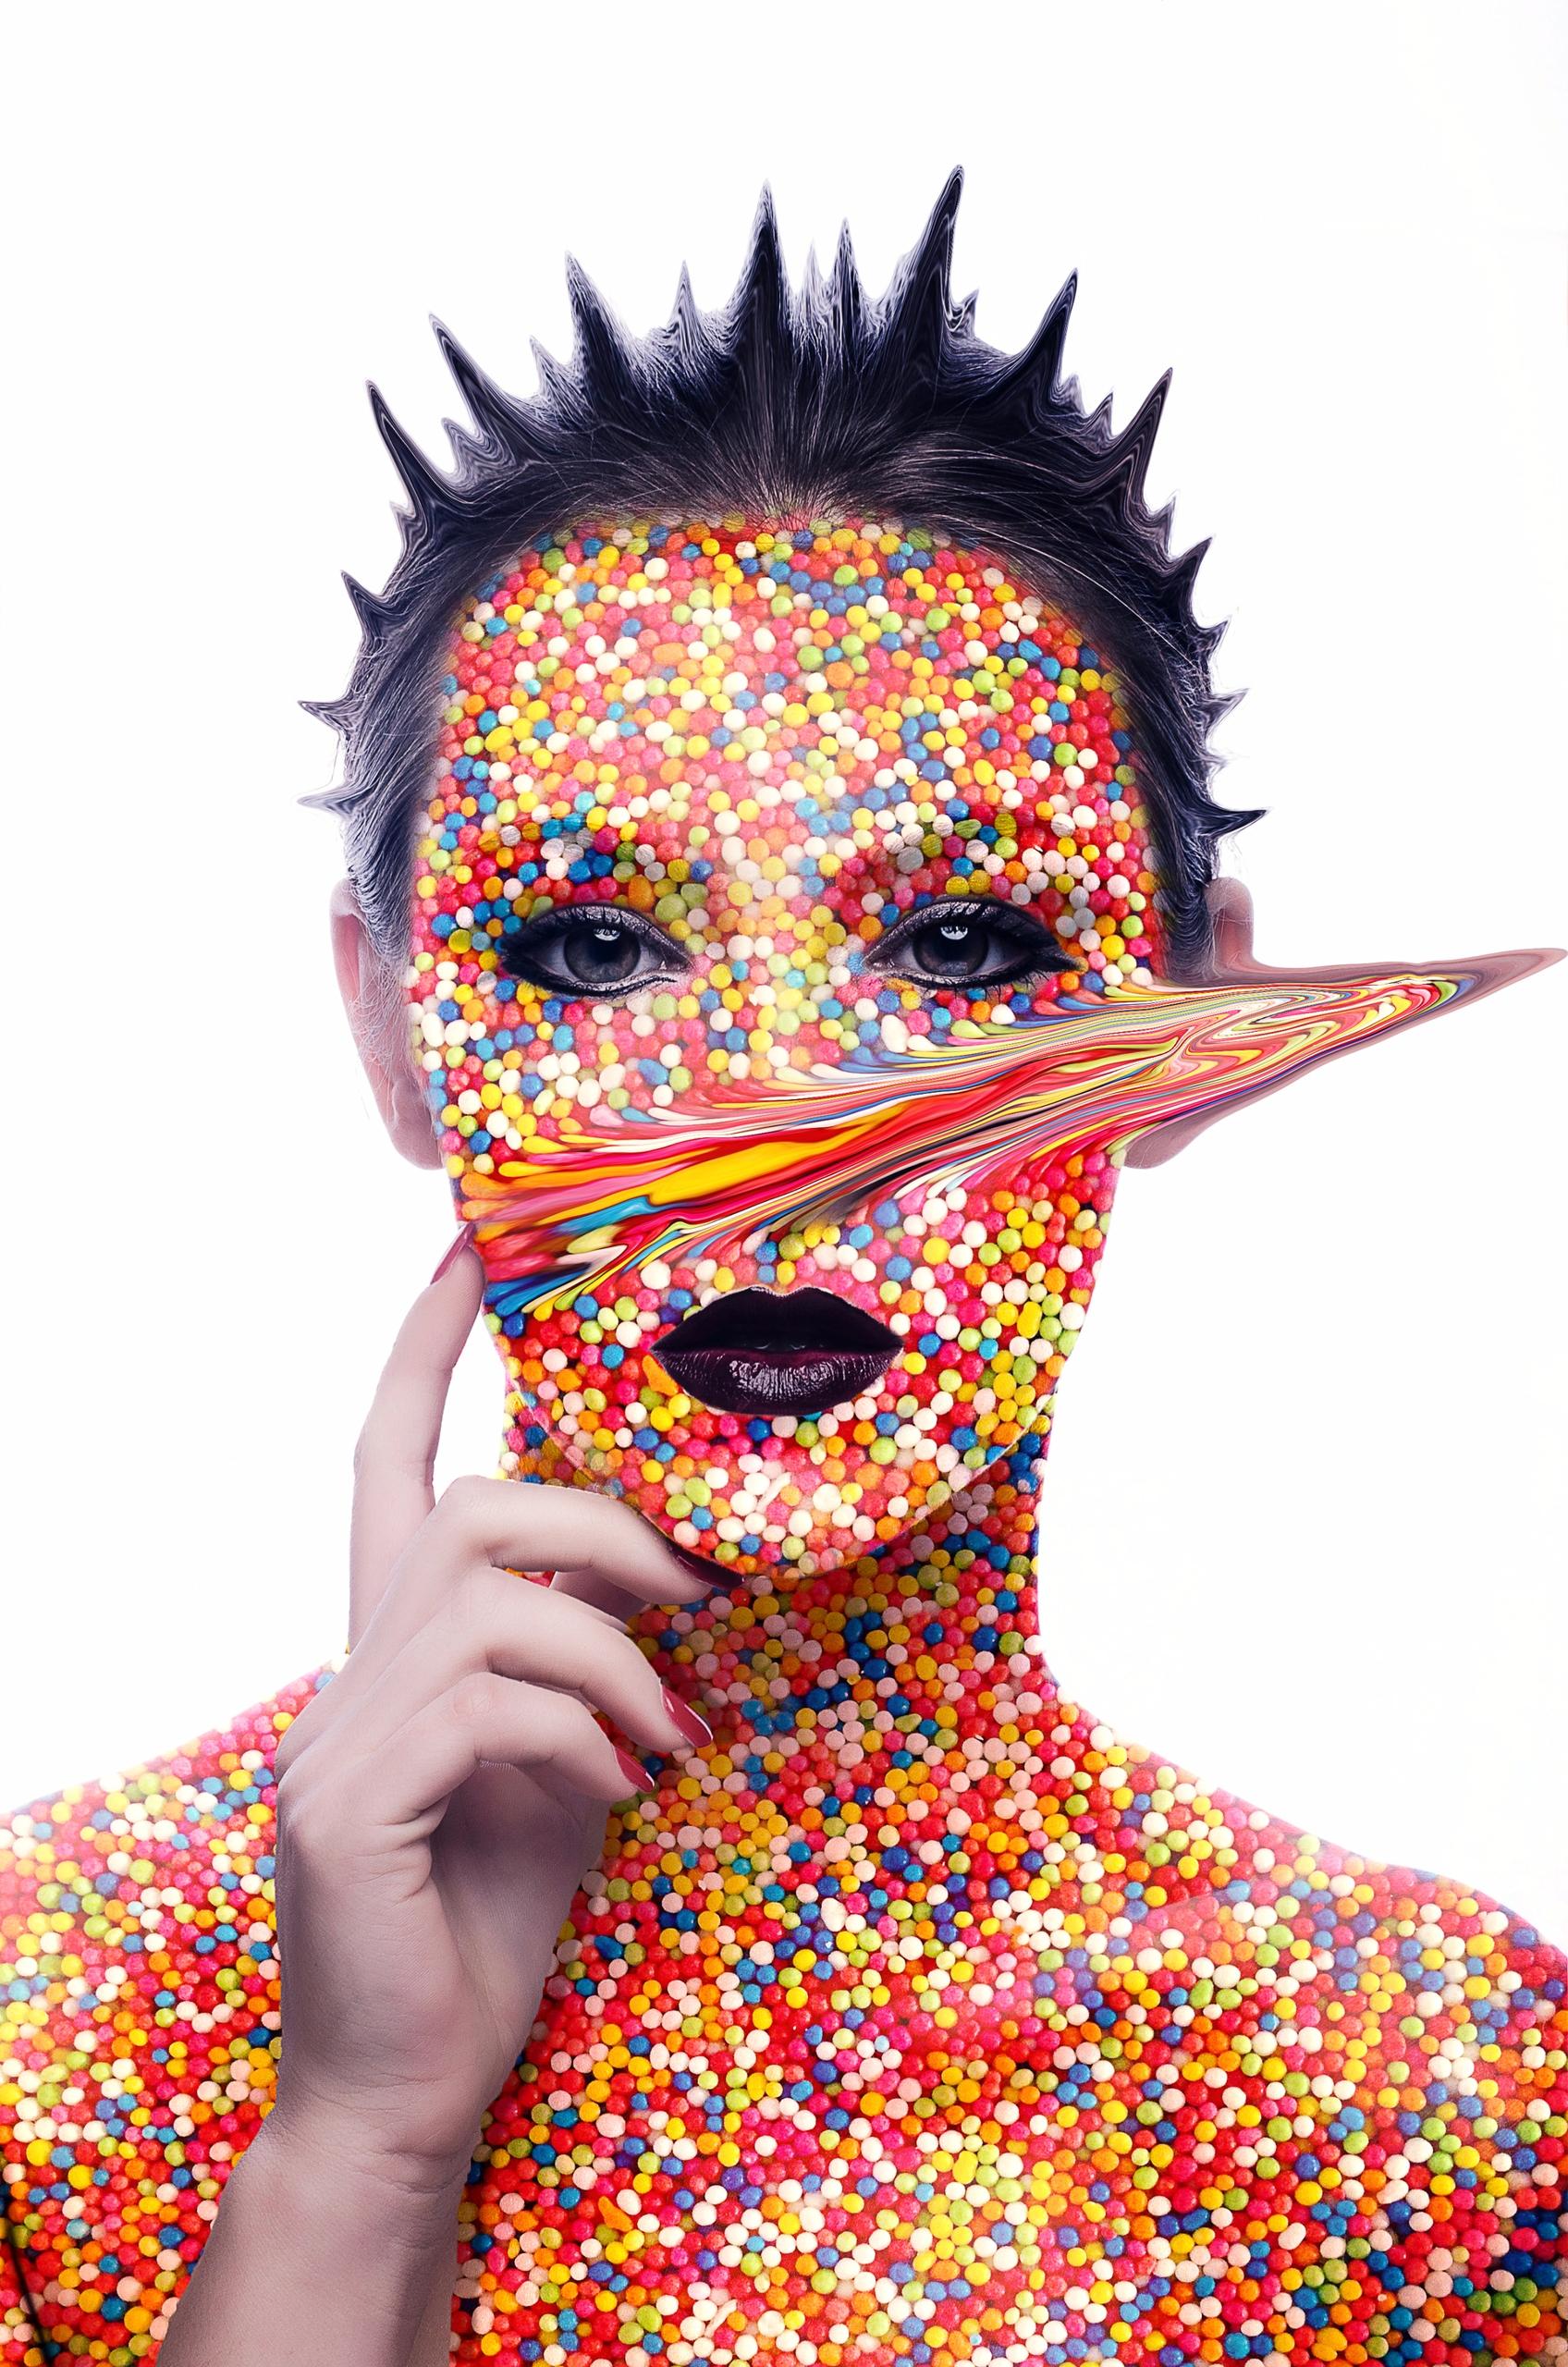 Candy-girl - photoshop, art, design - visualsofmh | ello